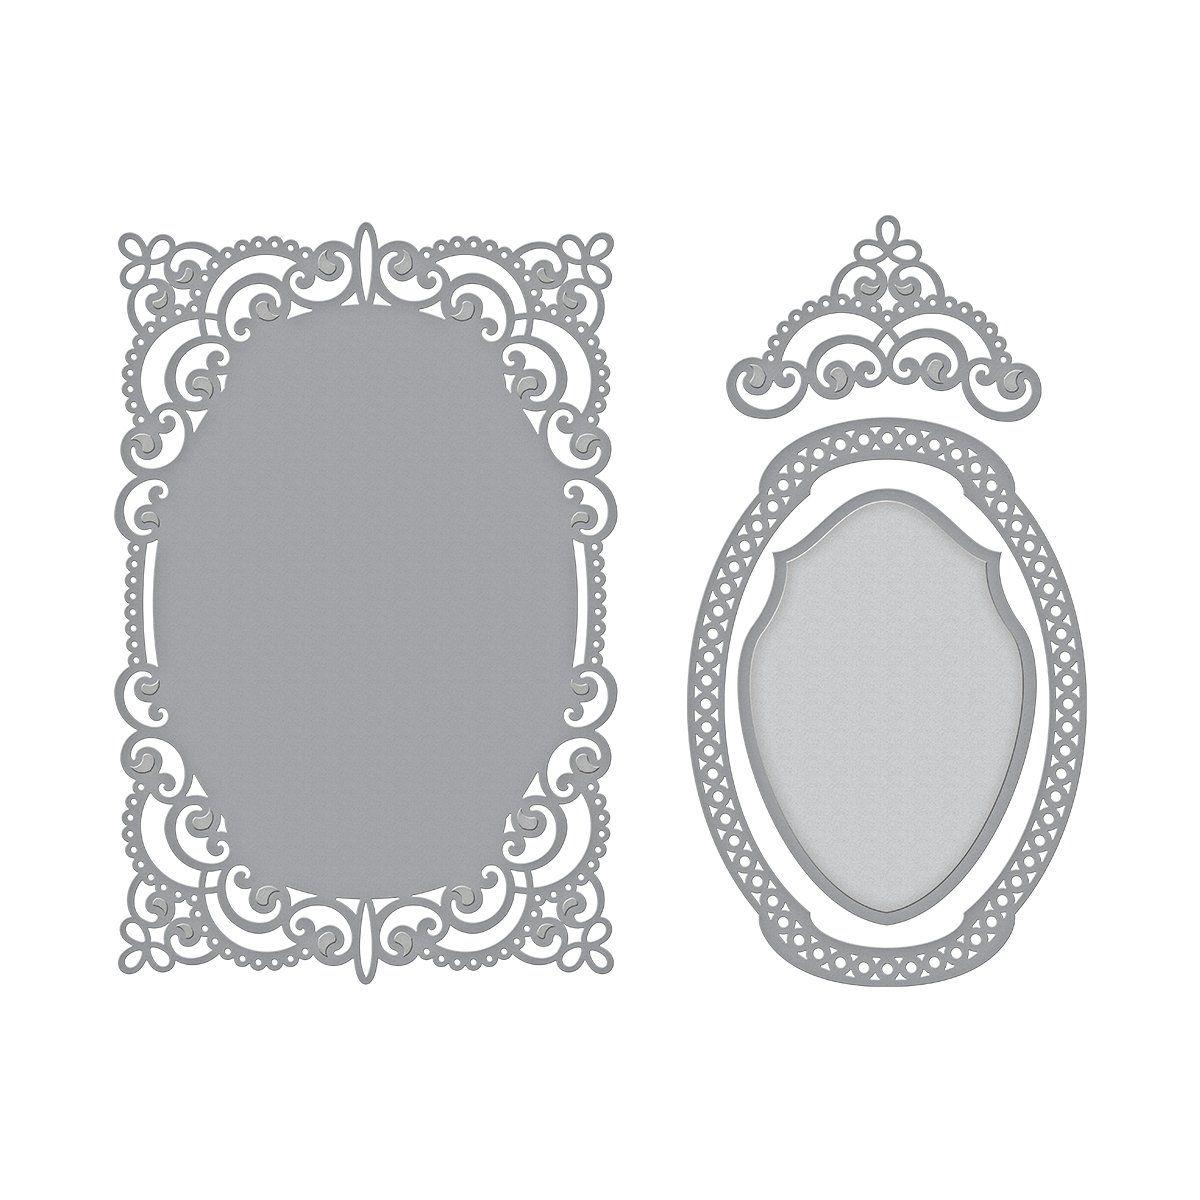 Grey Annibells heart mirror